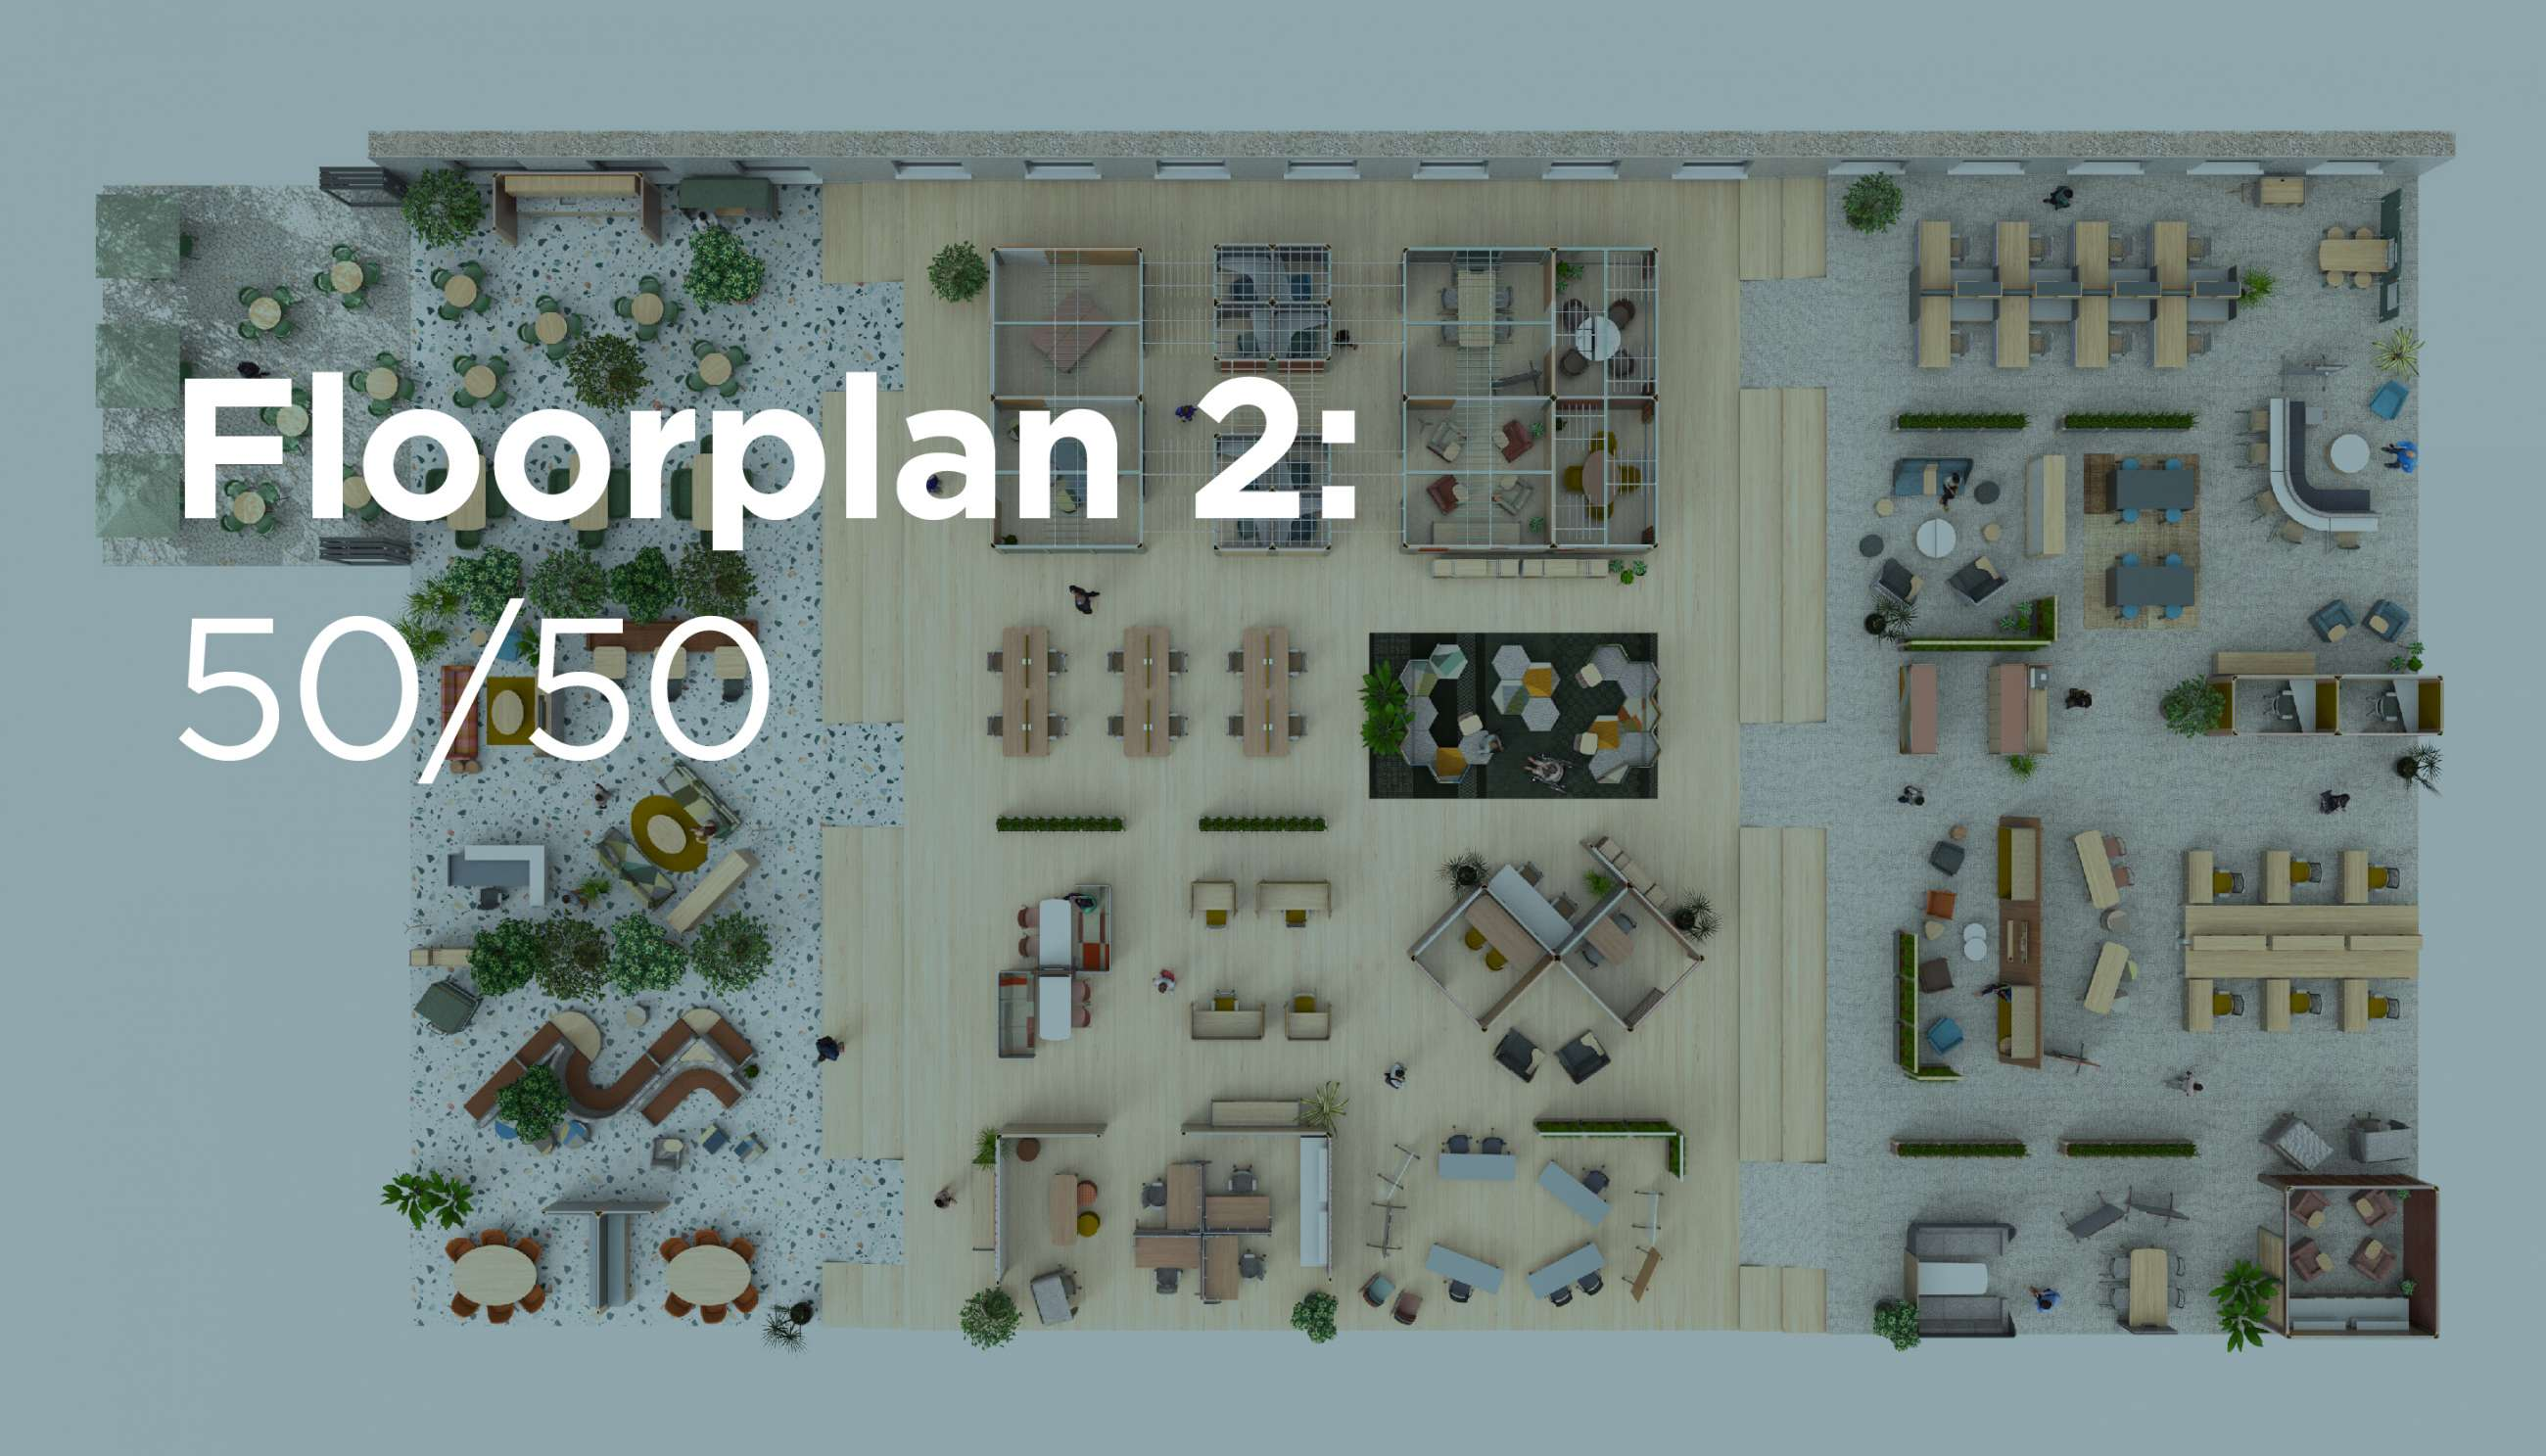 Floorplan 2: 50/50